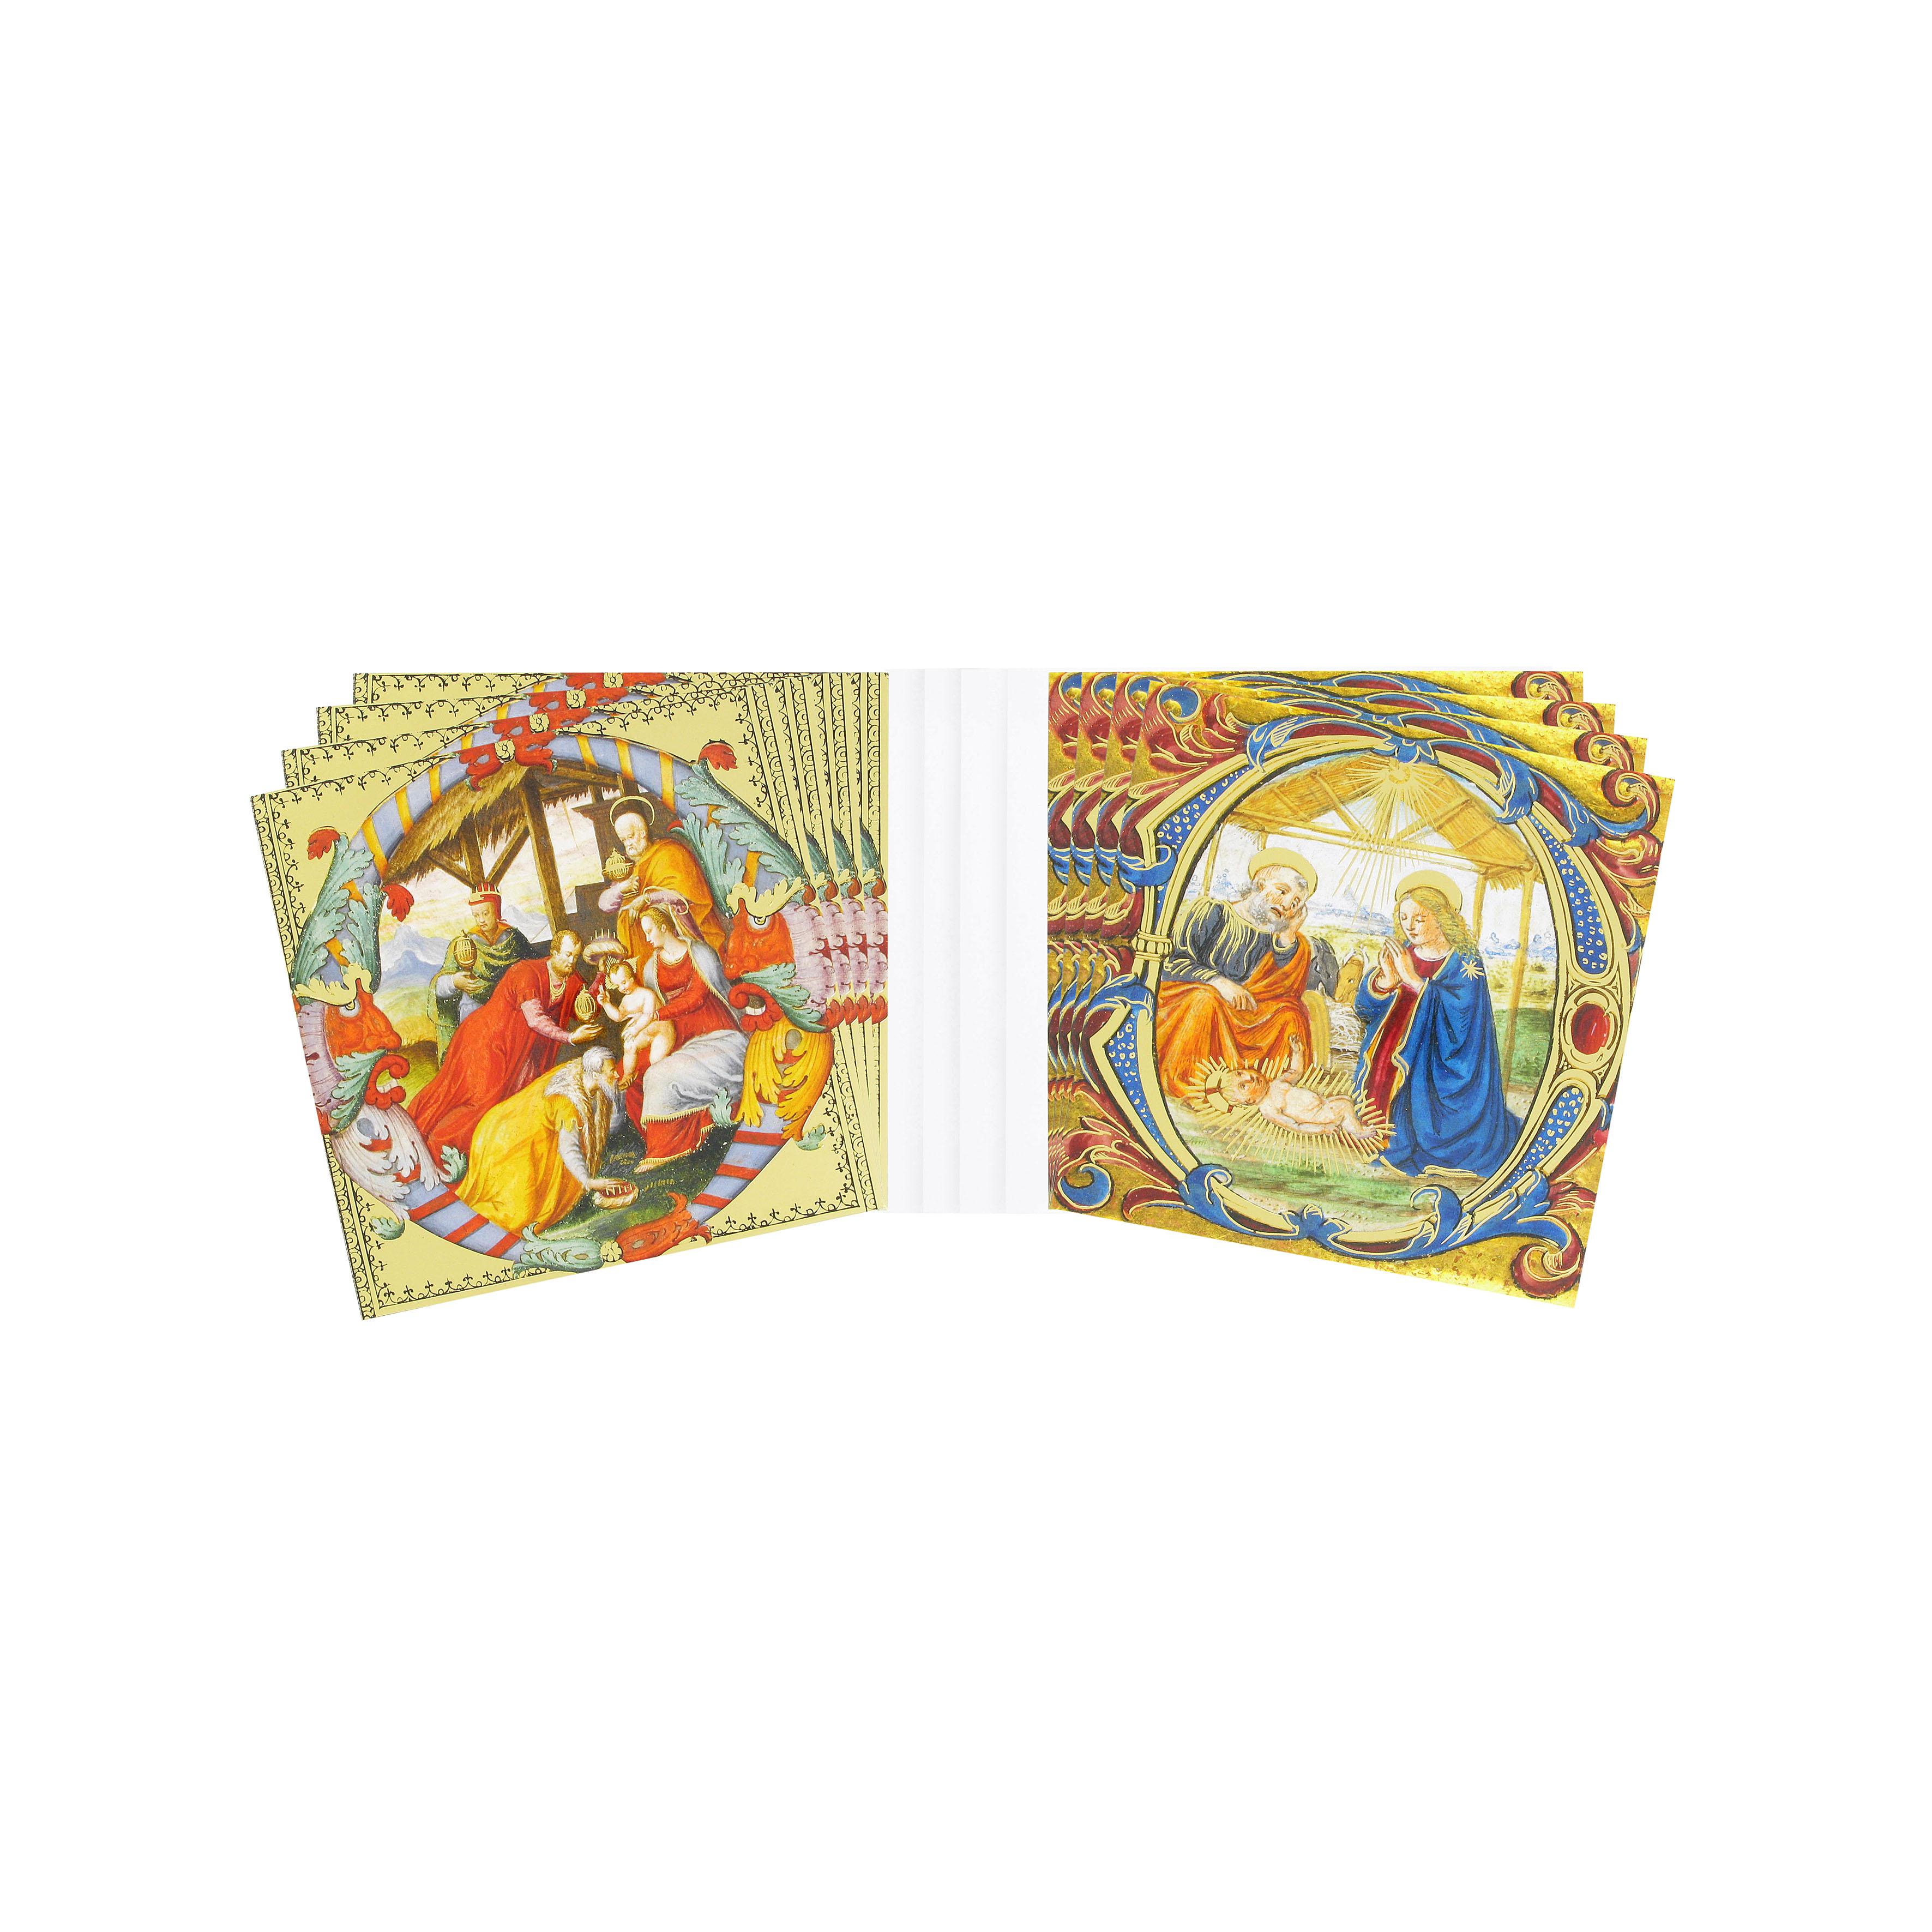 Illuminated Fitzwilliam Christmas cards